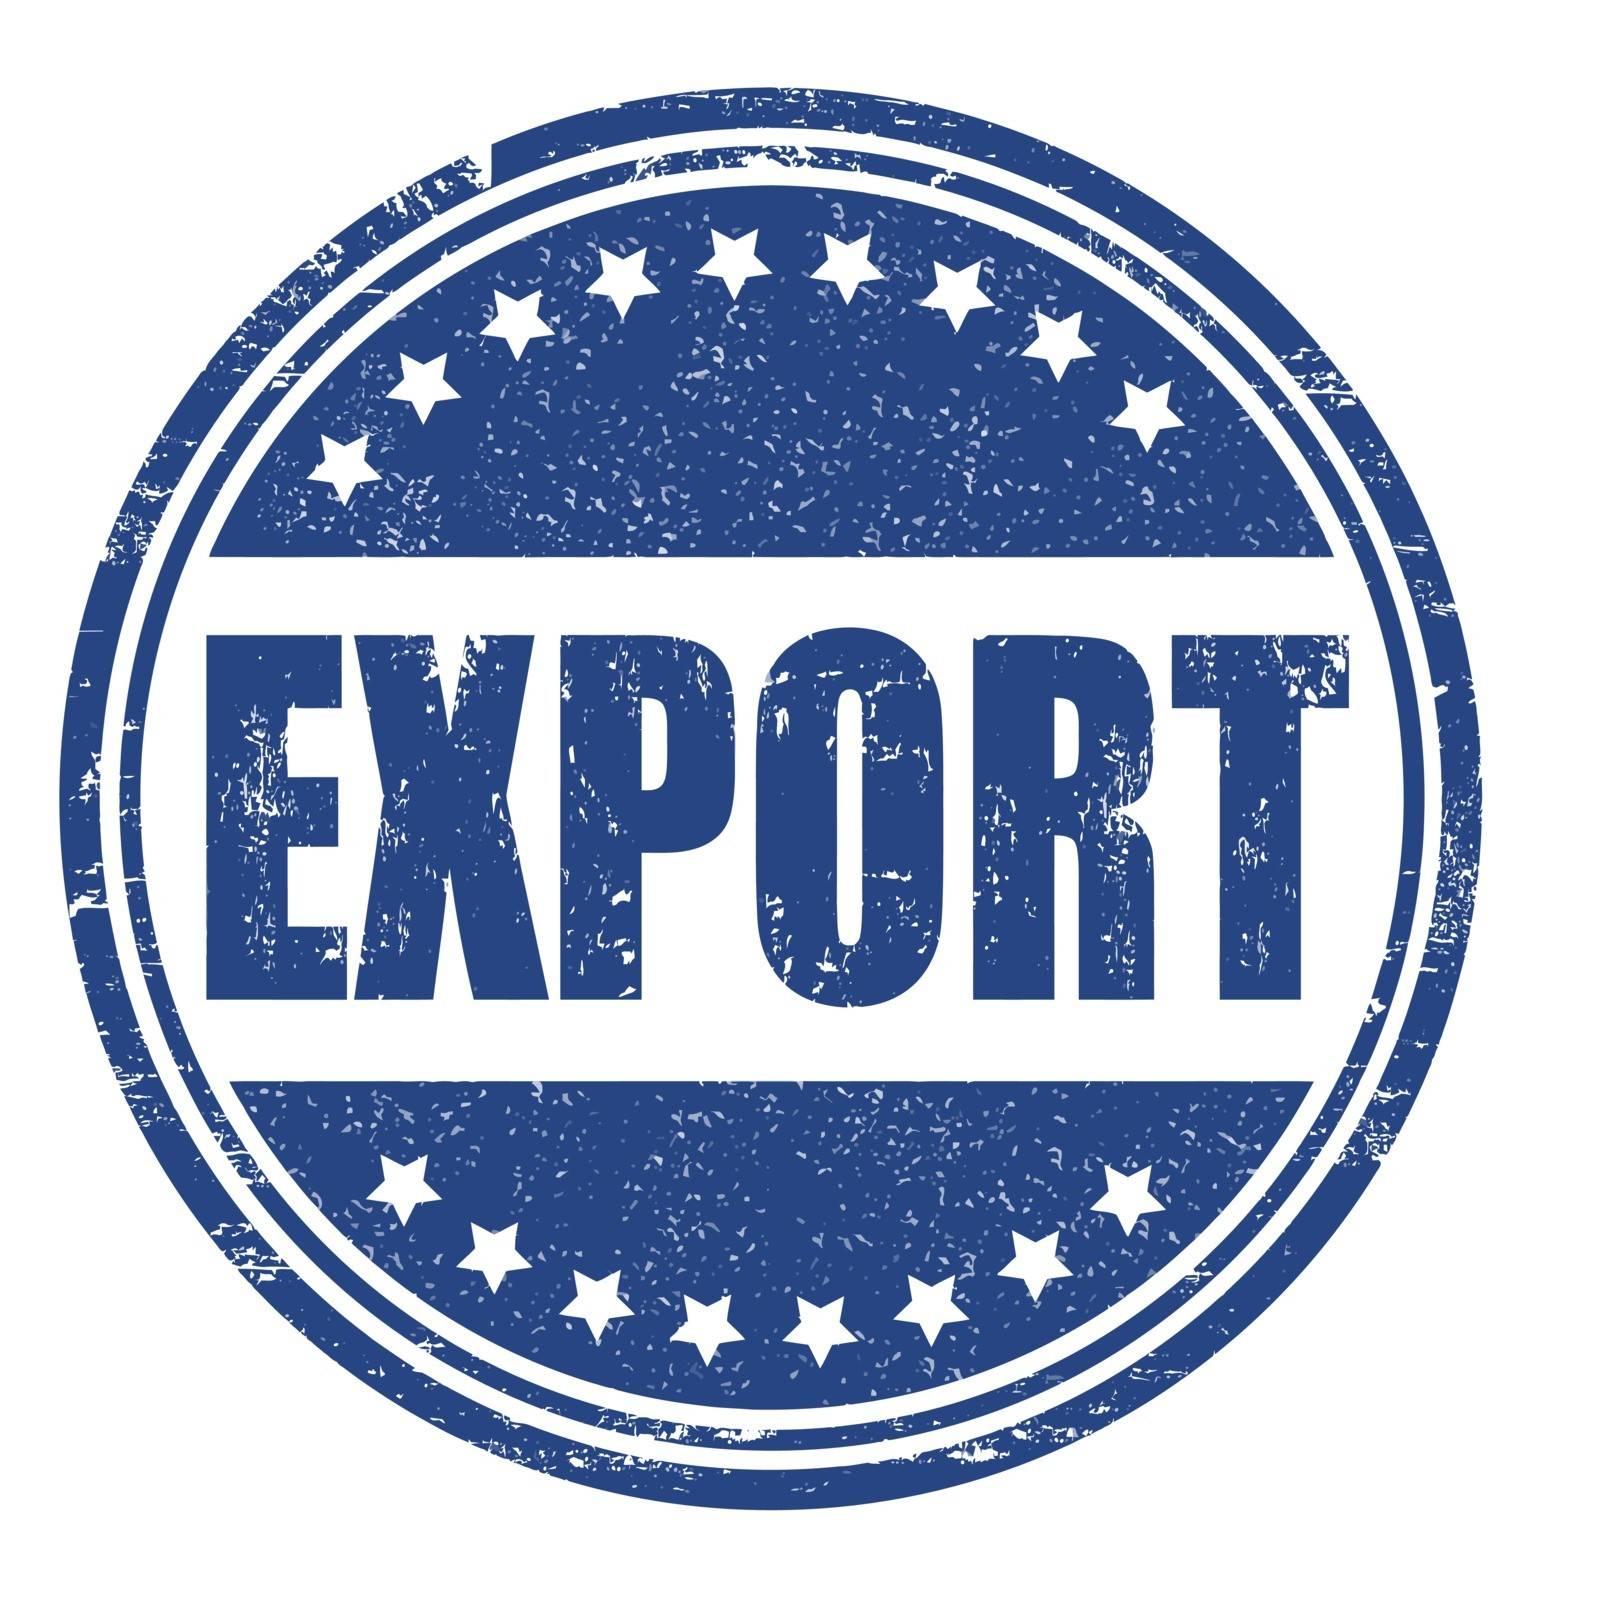 Export grunge rubber stamp on white, vector illustration